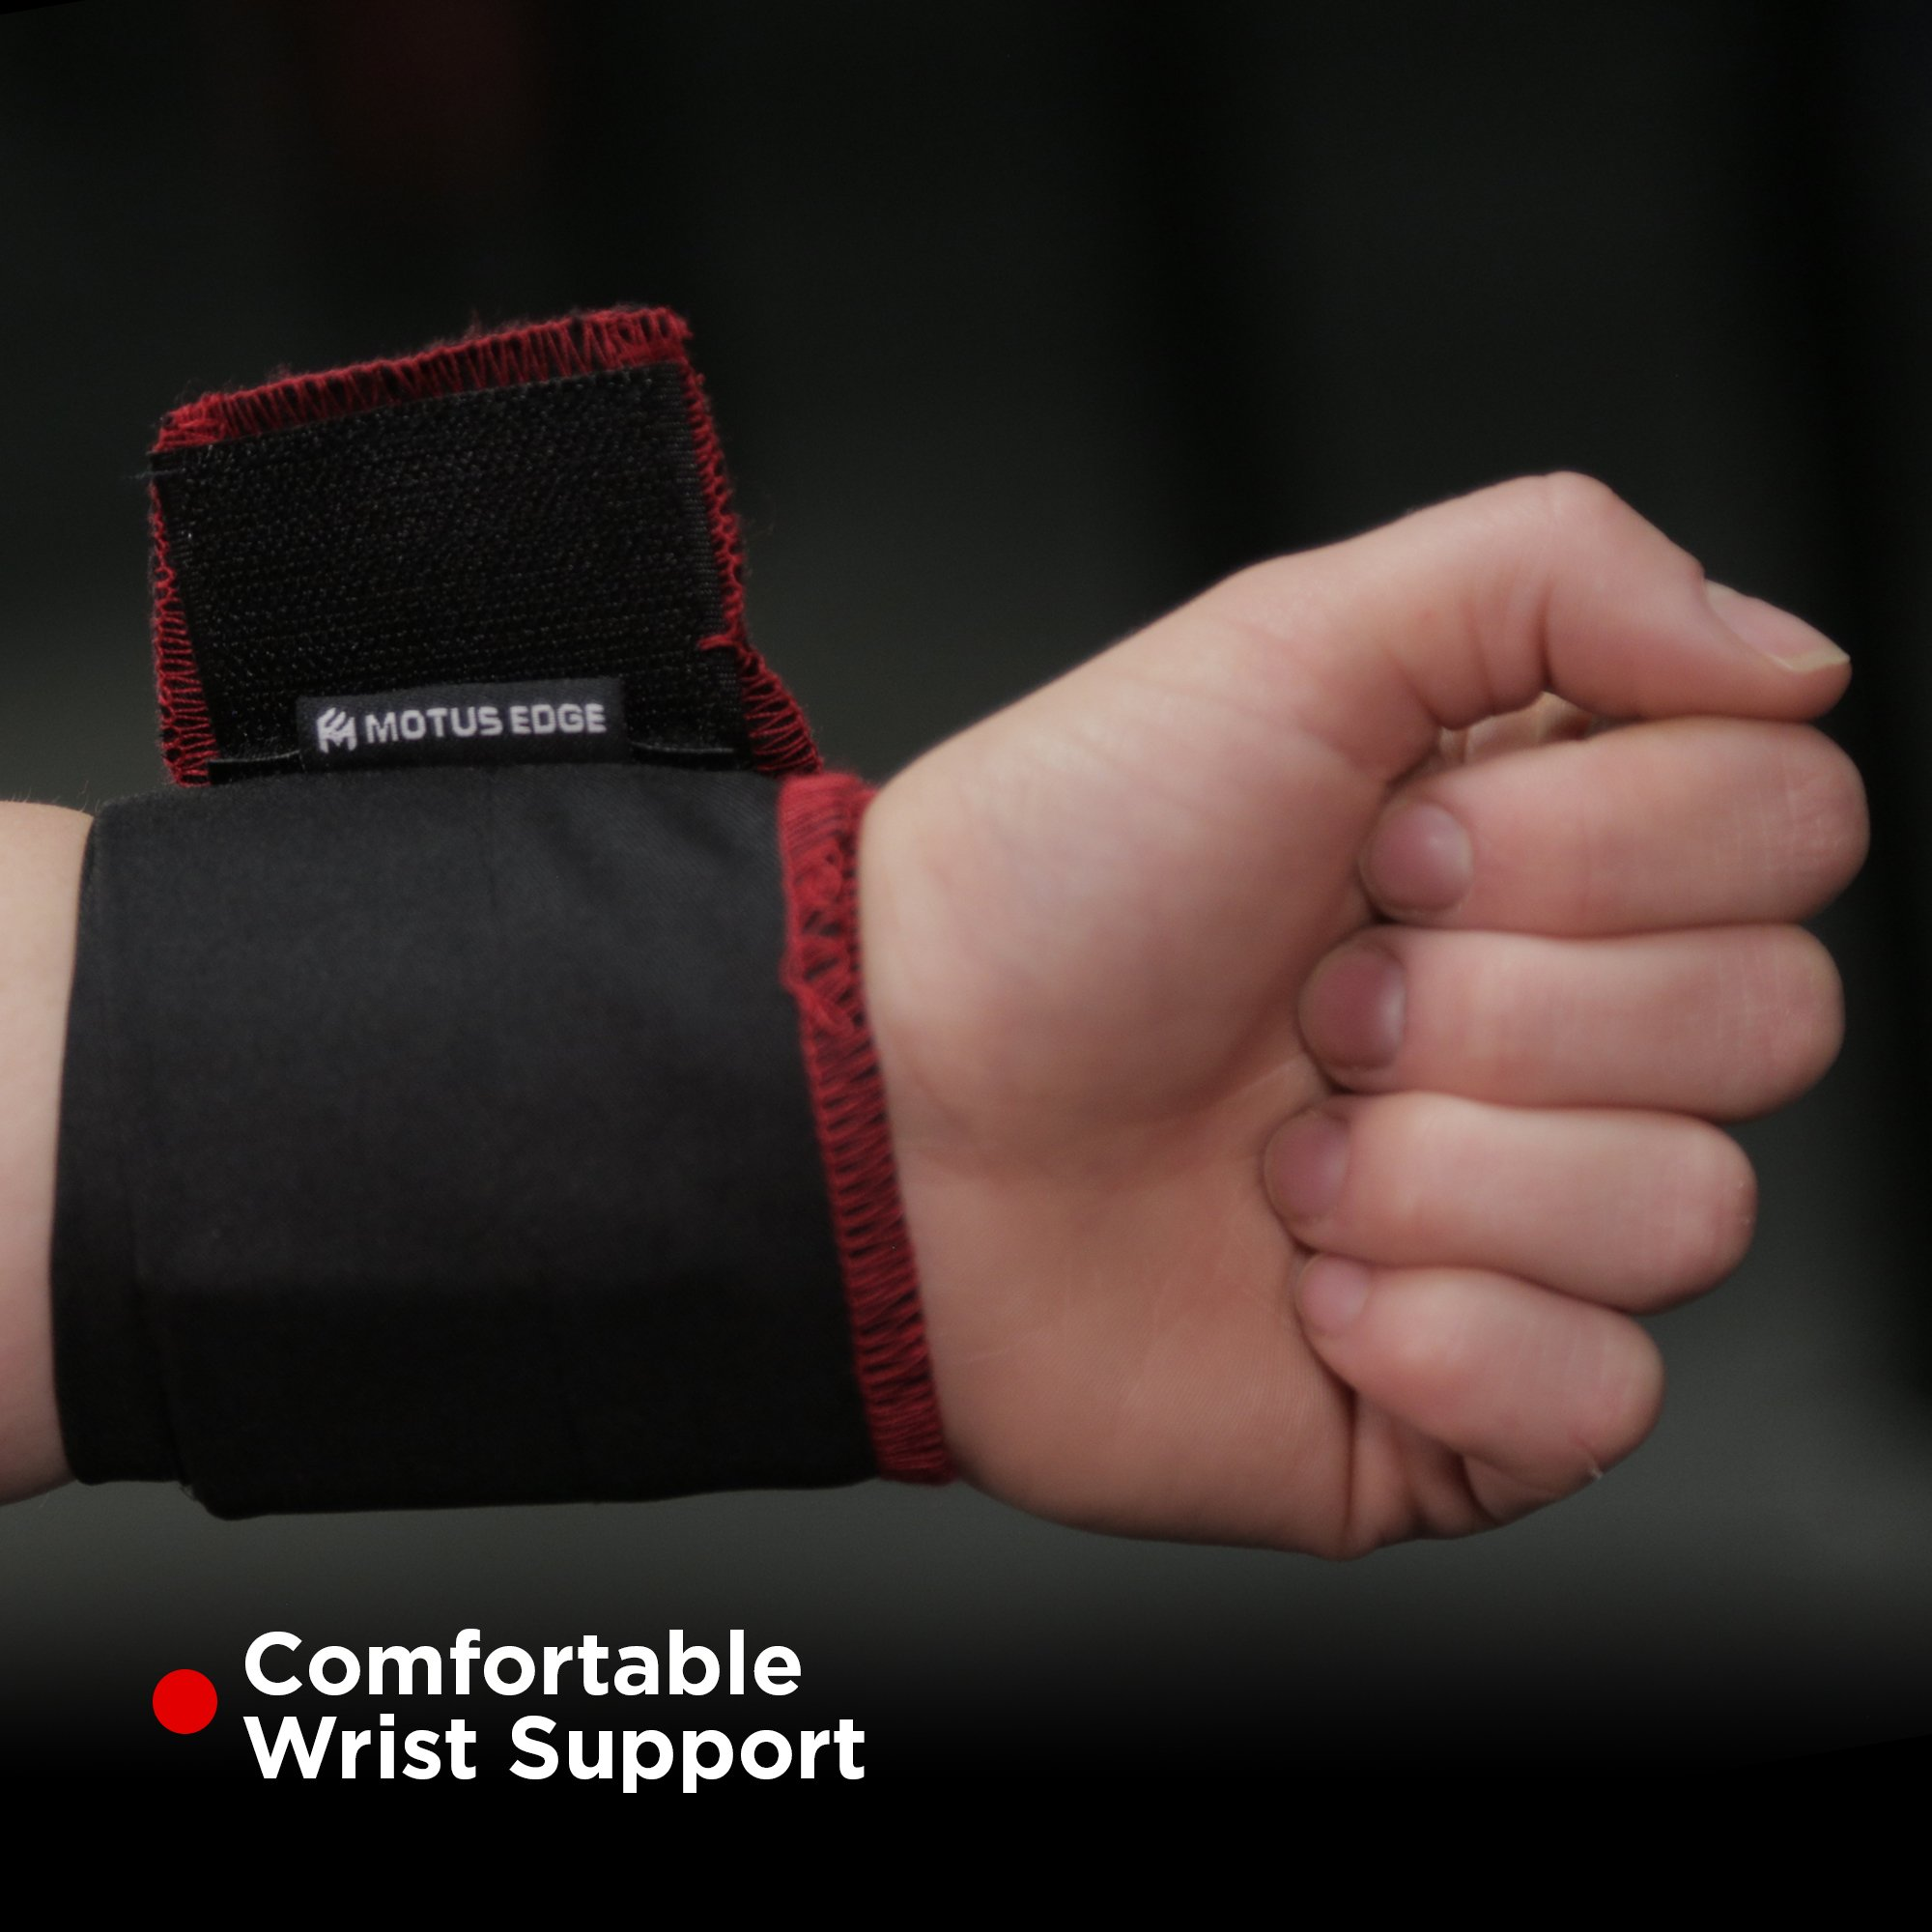 Motus Edge CrossFit Starter Kit - Palm Grips, Wrist Wraps, Speed Jump Rope - Handy Carry Bag by Motus Edge (Image #4)